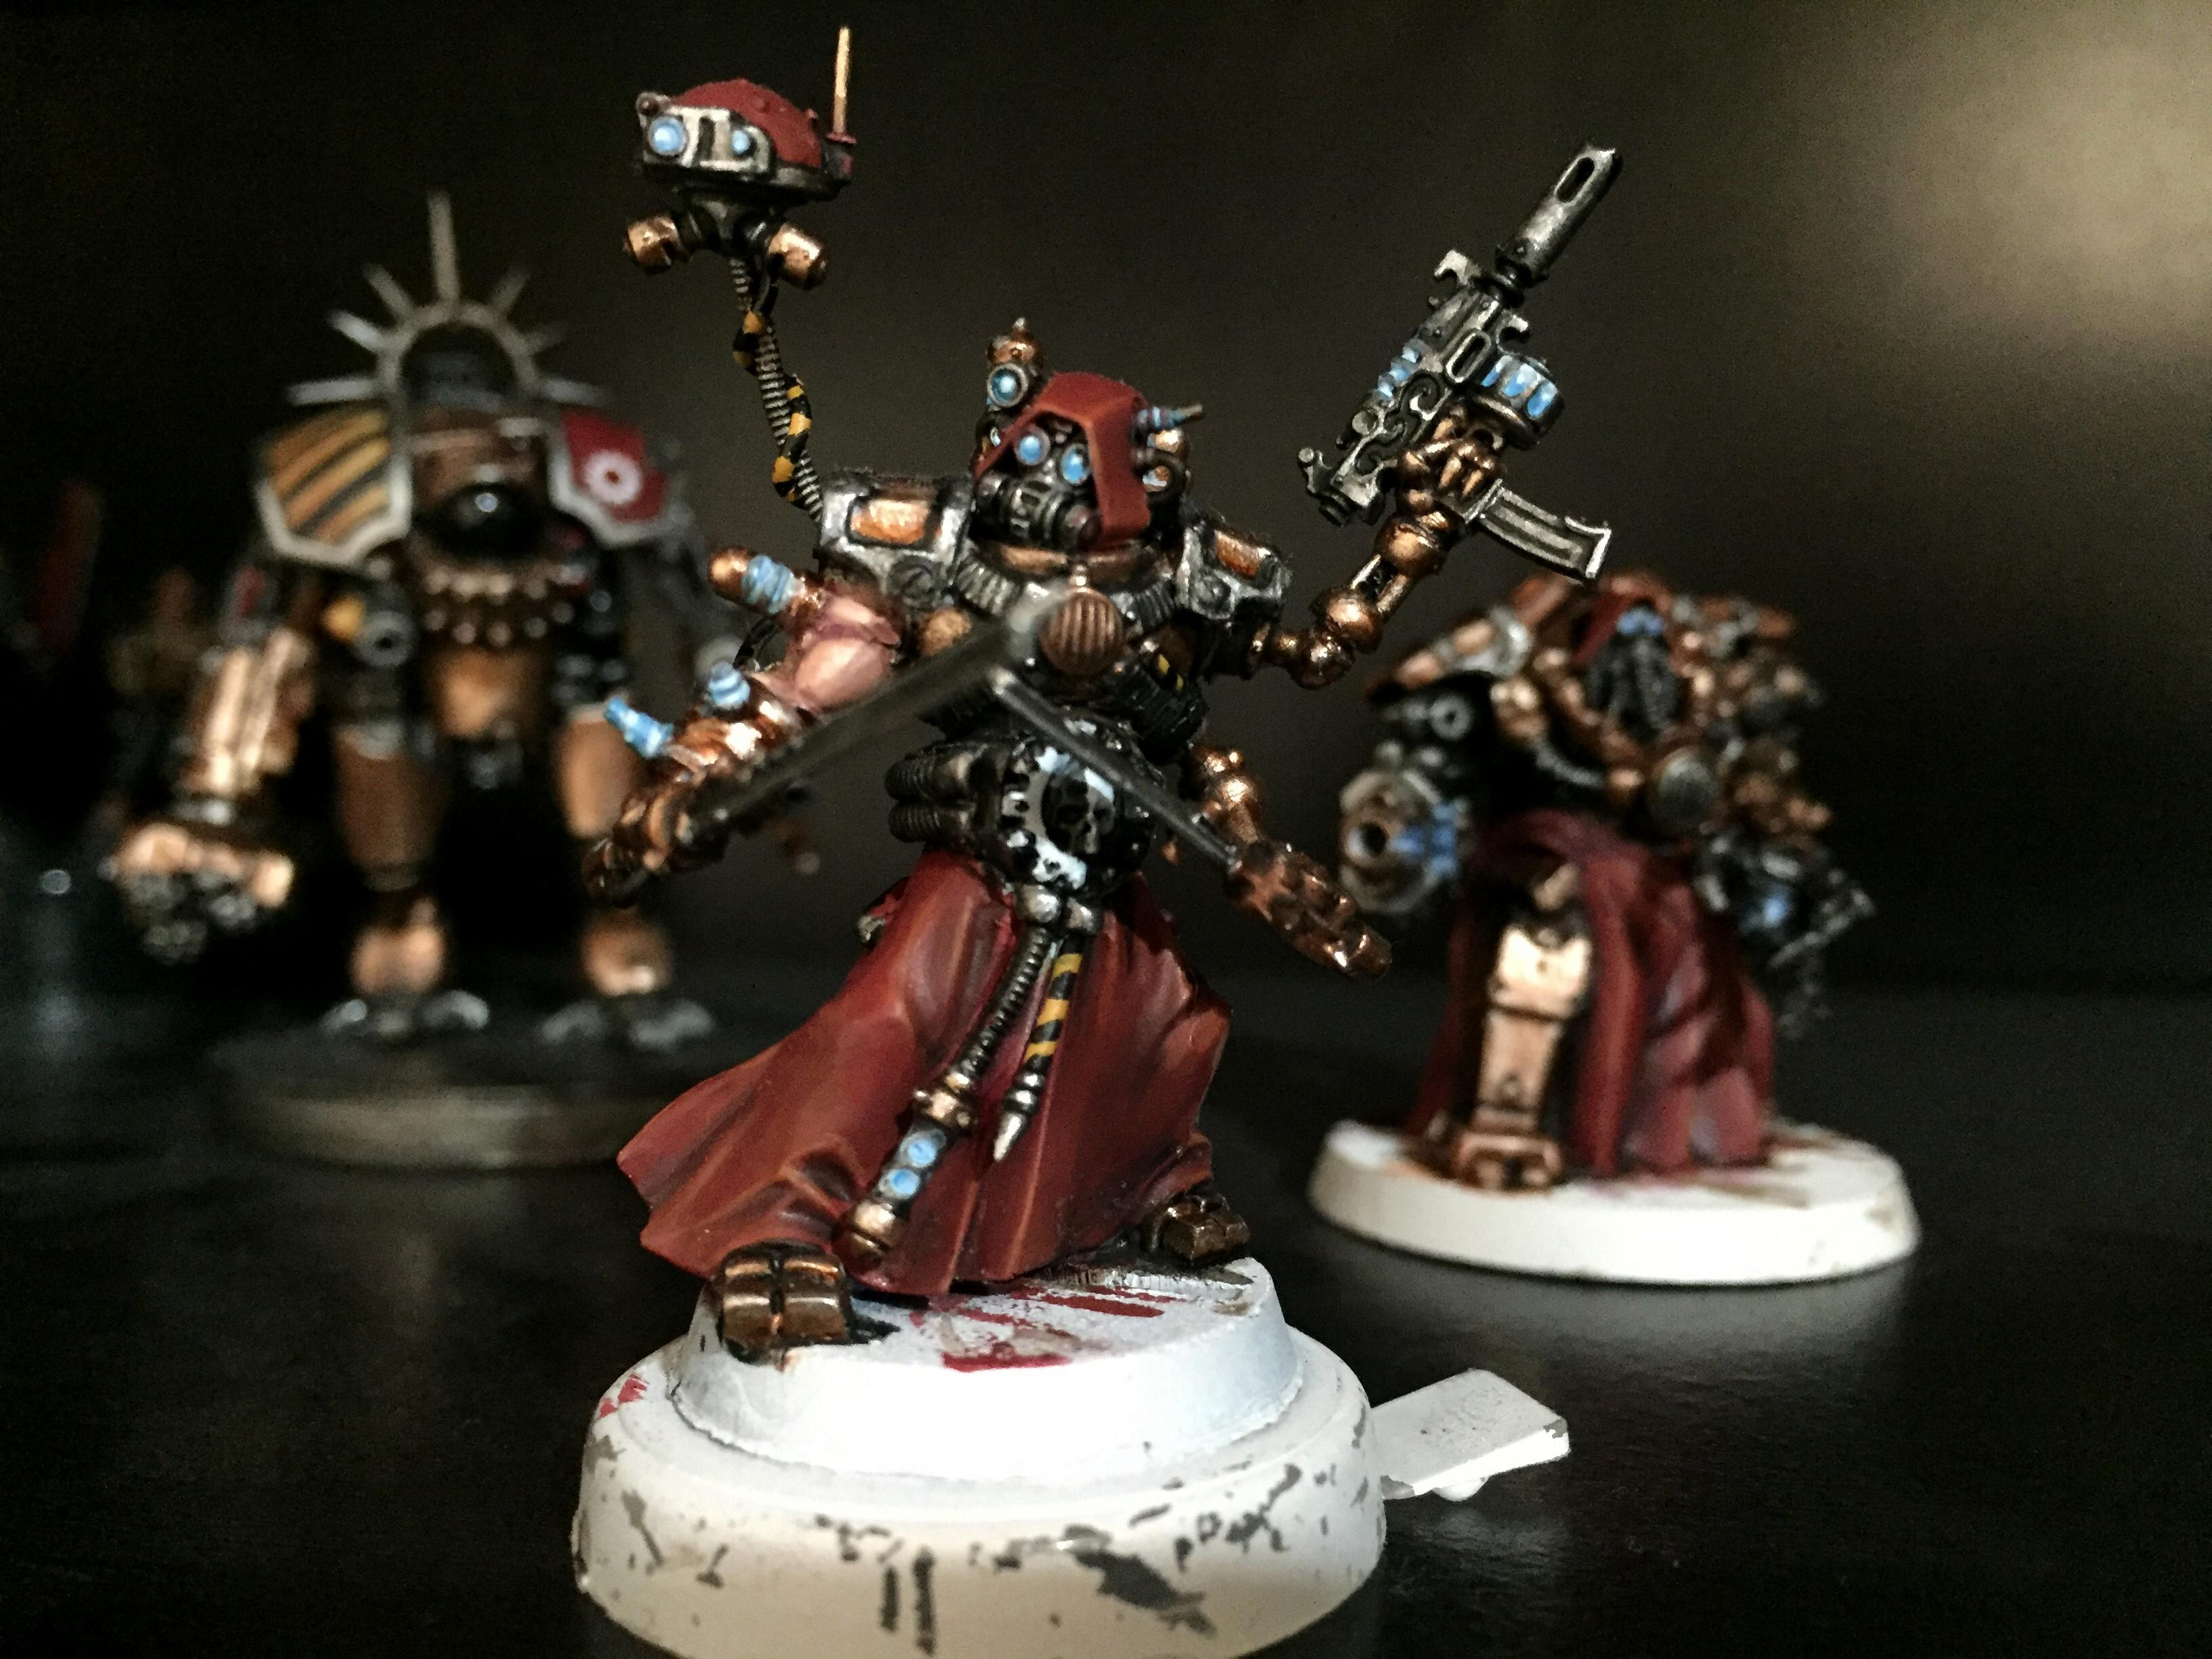 Ad Mech, Adeptus, Admech, Mechanicus, Skitarrii, Warhammer 40,000